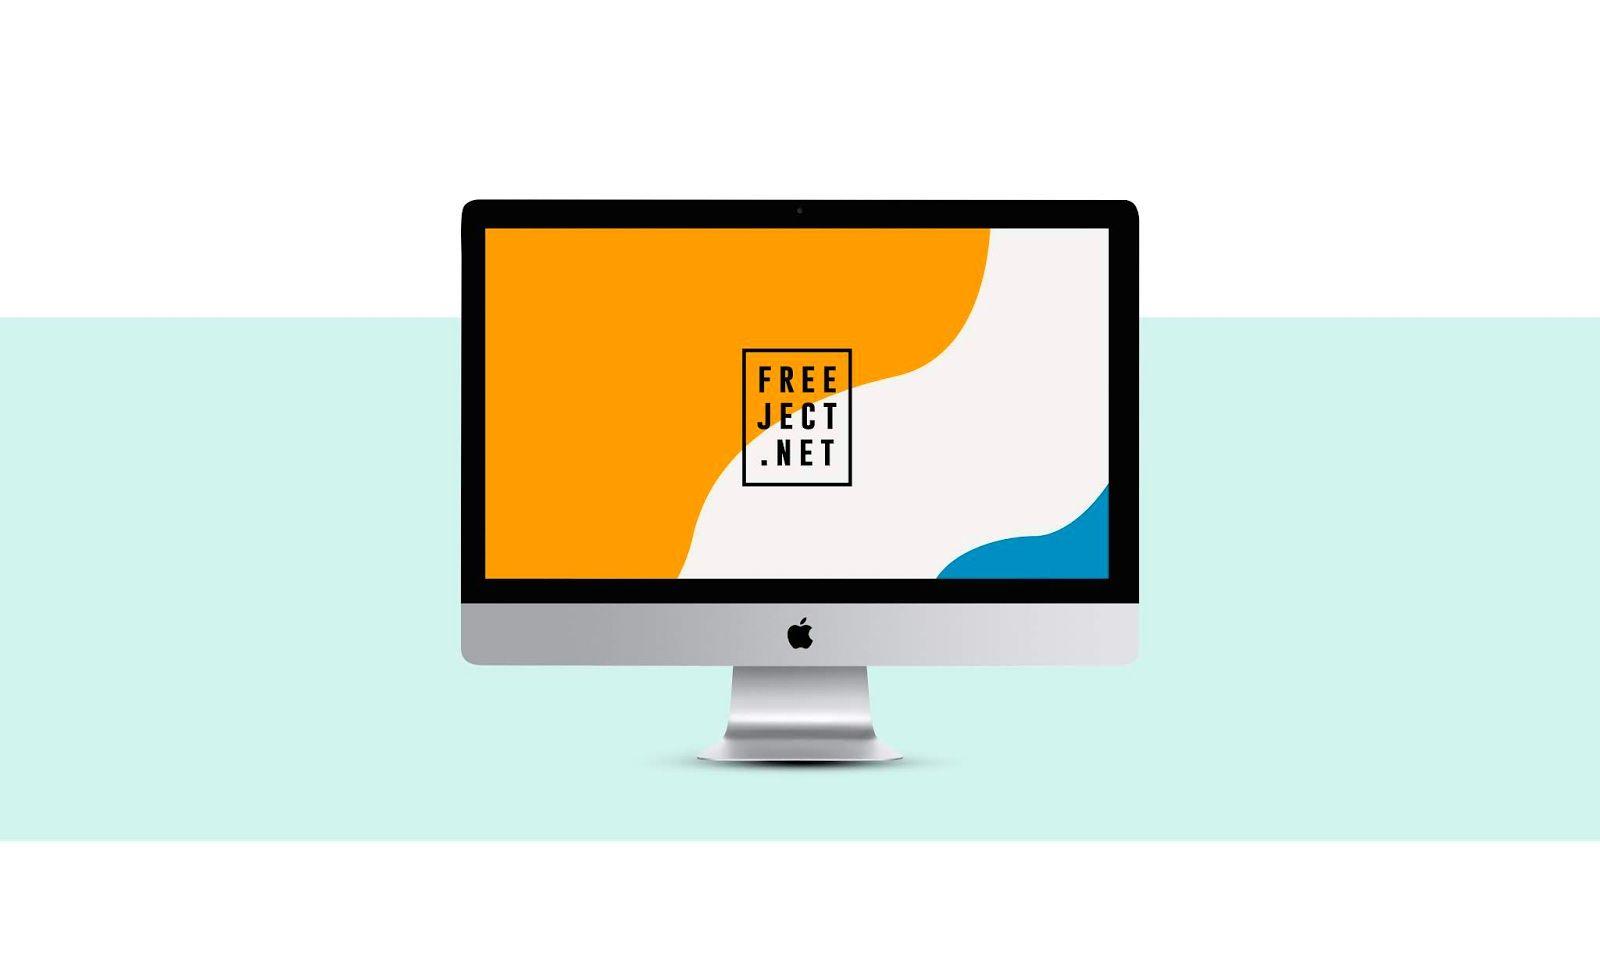 Freeject Net Free Download Imac Mockup Template Psd File Mockup Template Imac Mockup